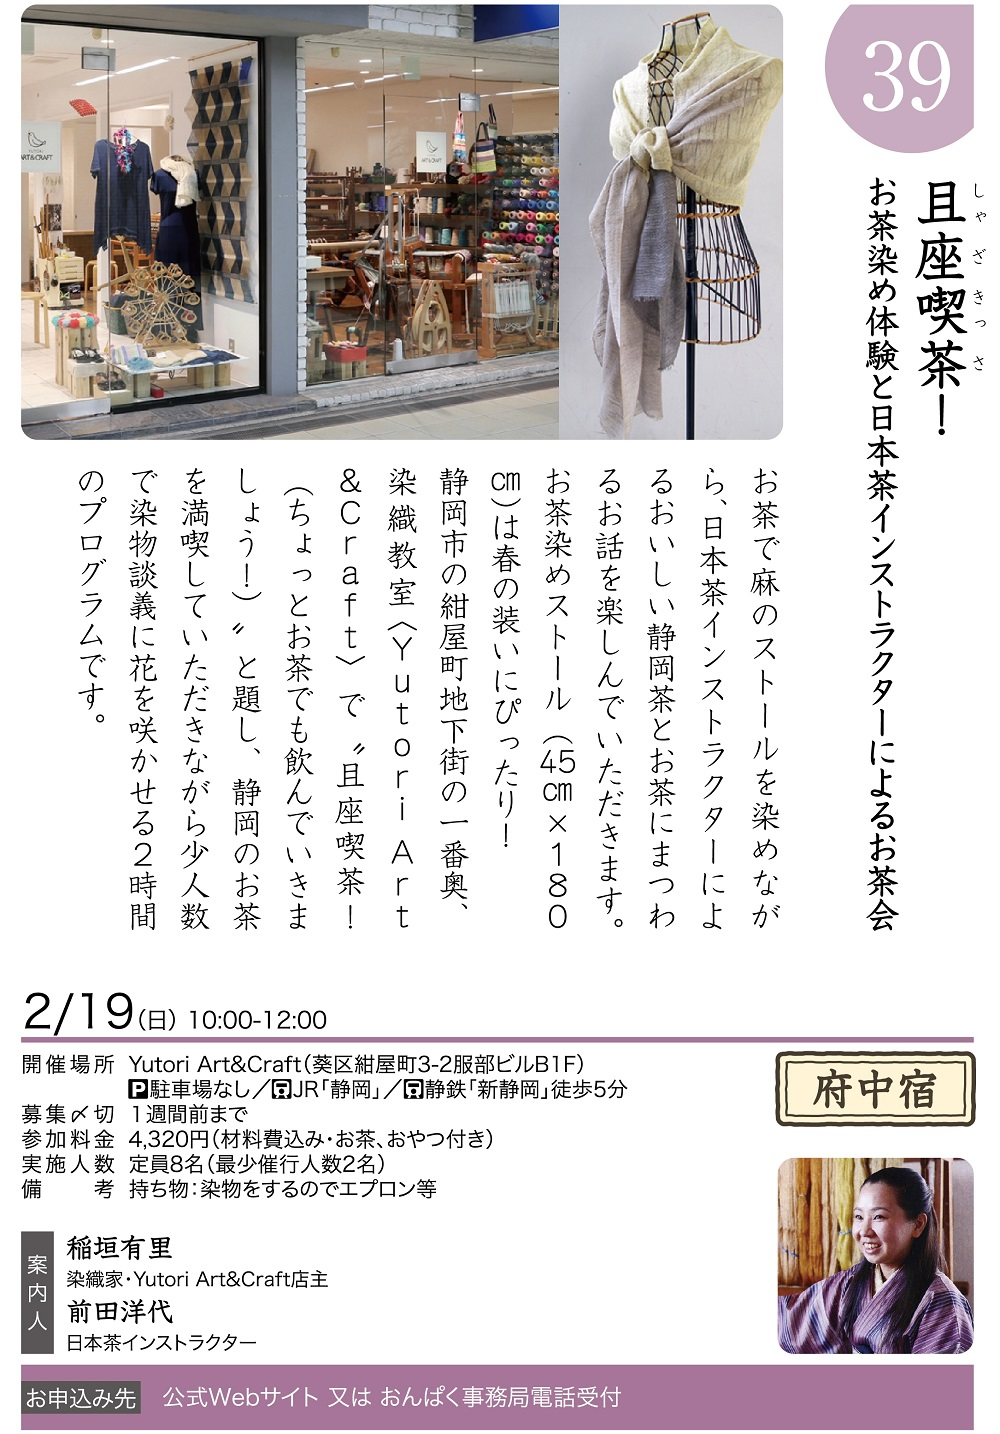 39_yutori_artcraft